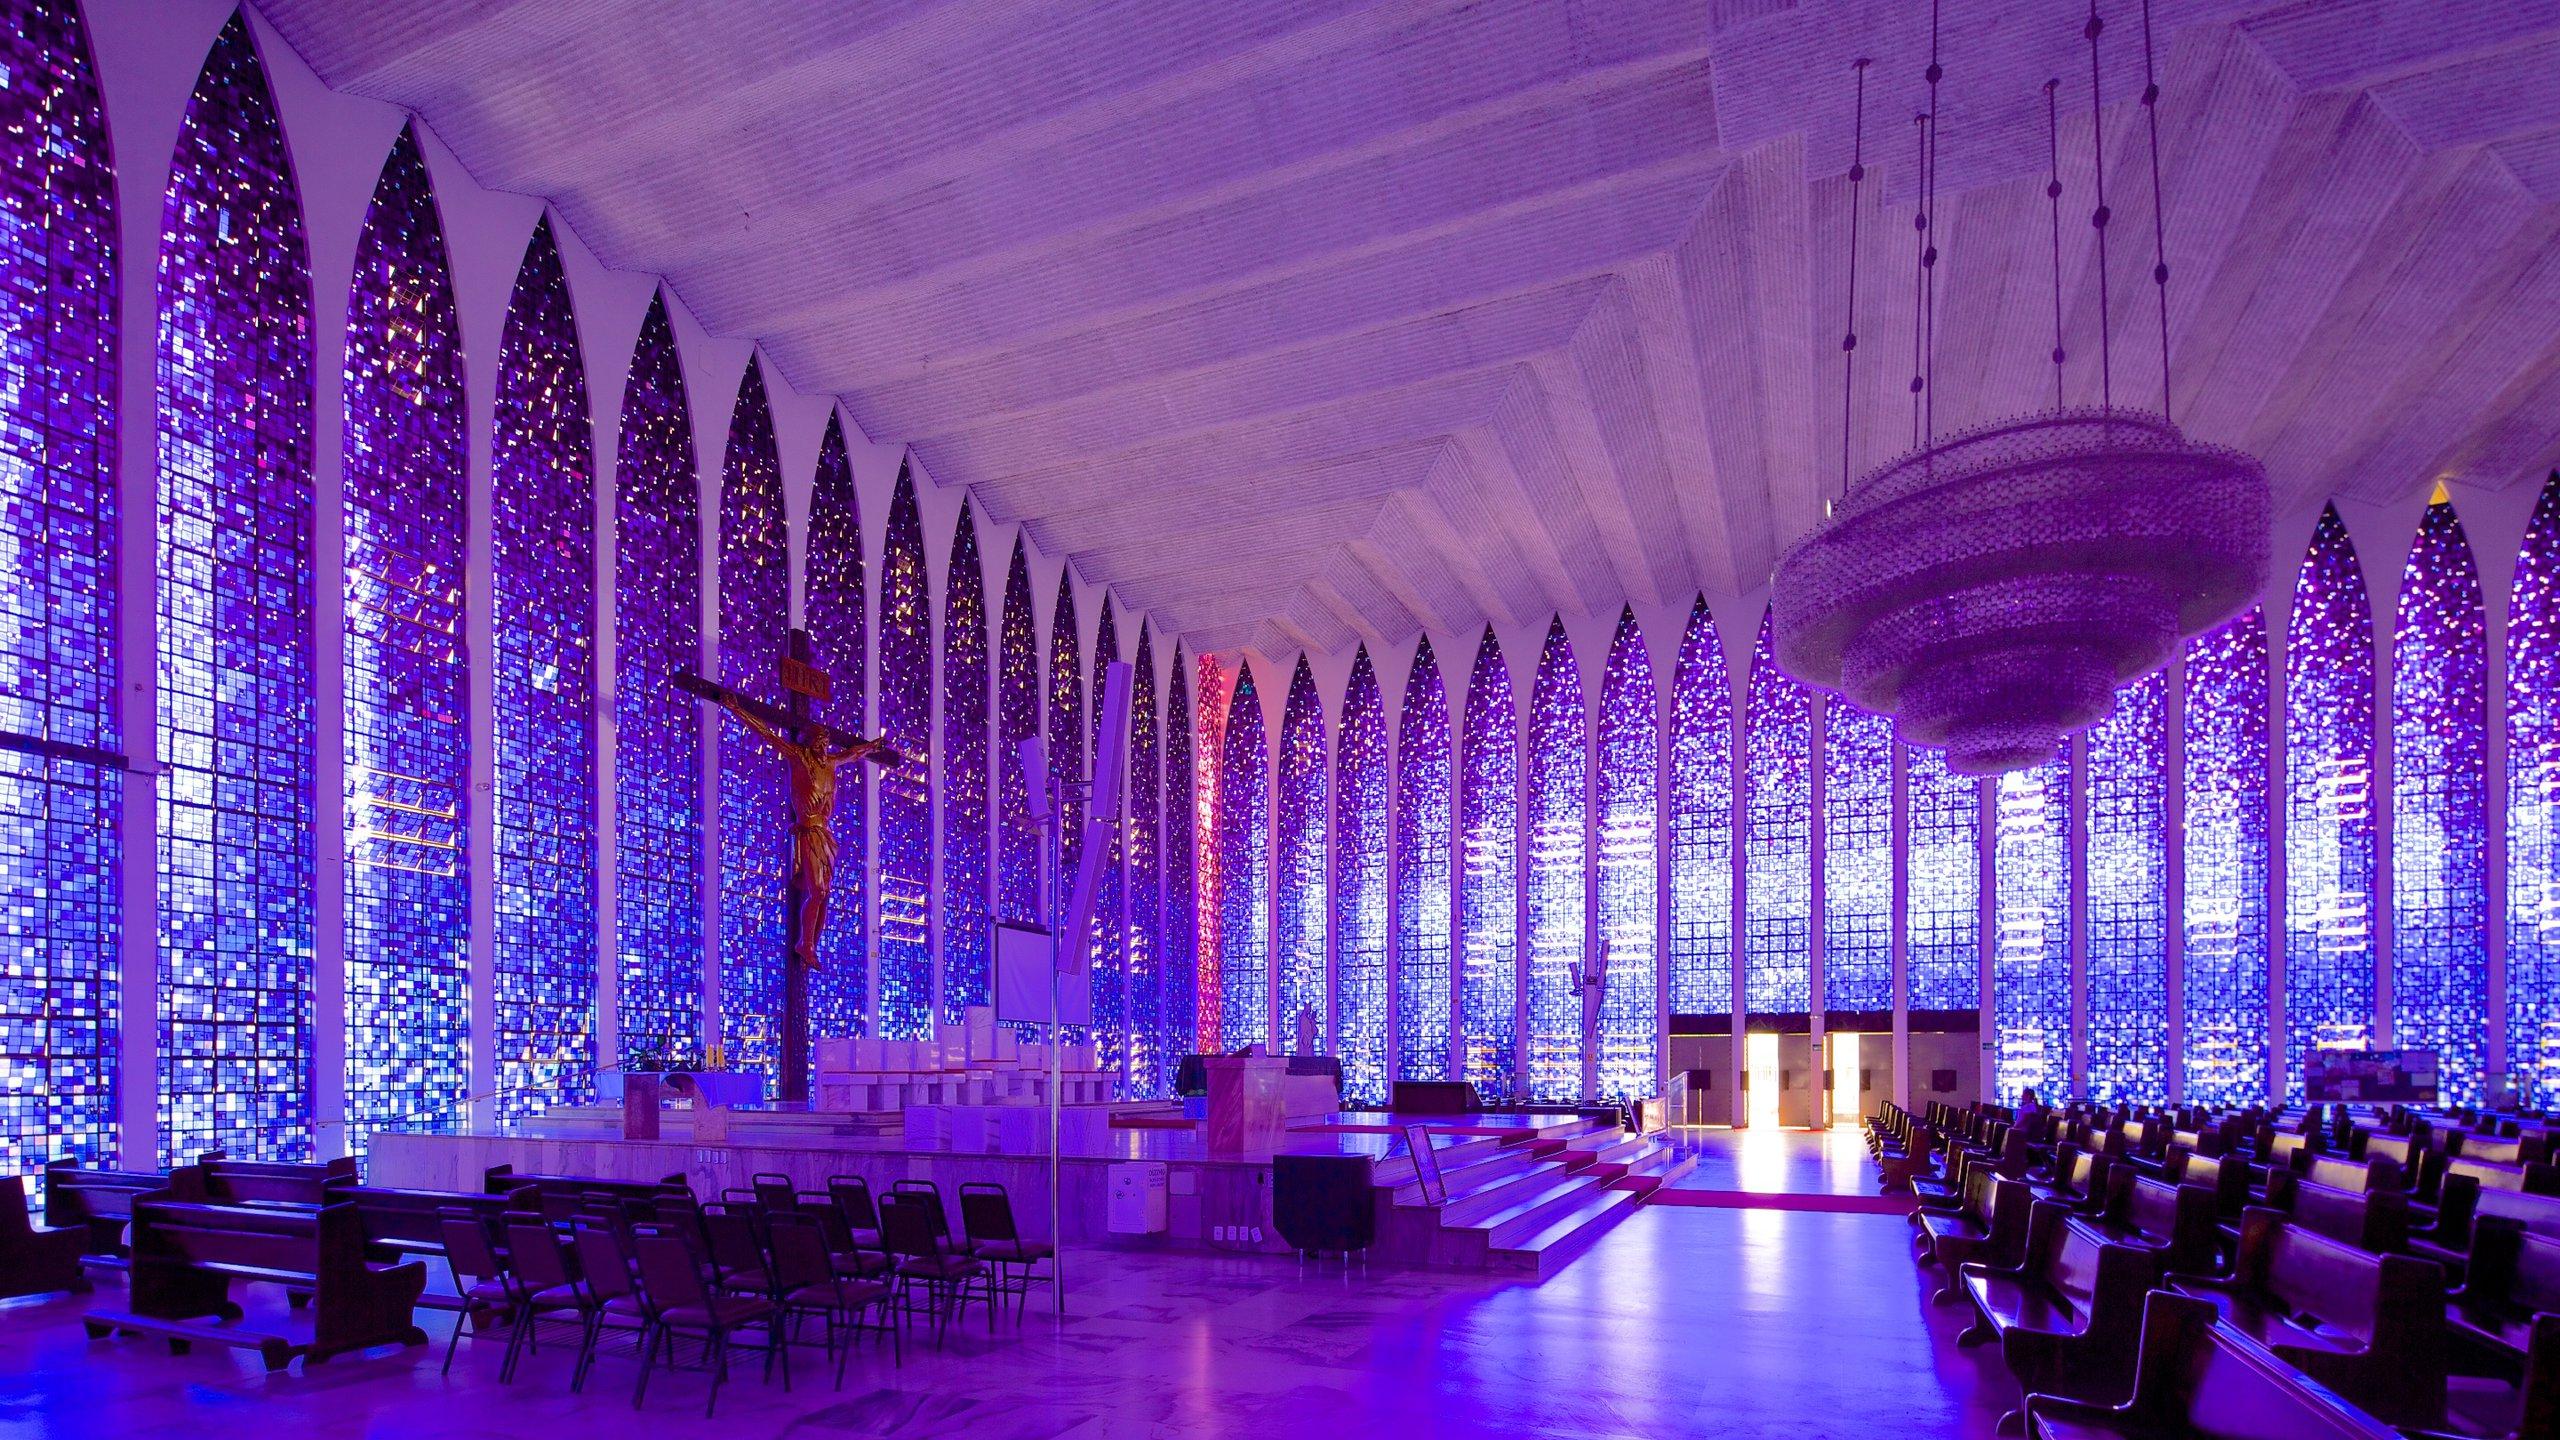 Asa Sul, Brasilia, Federal District State, Brazil